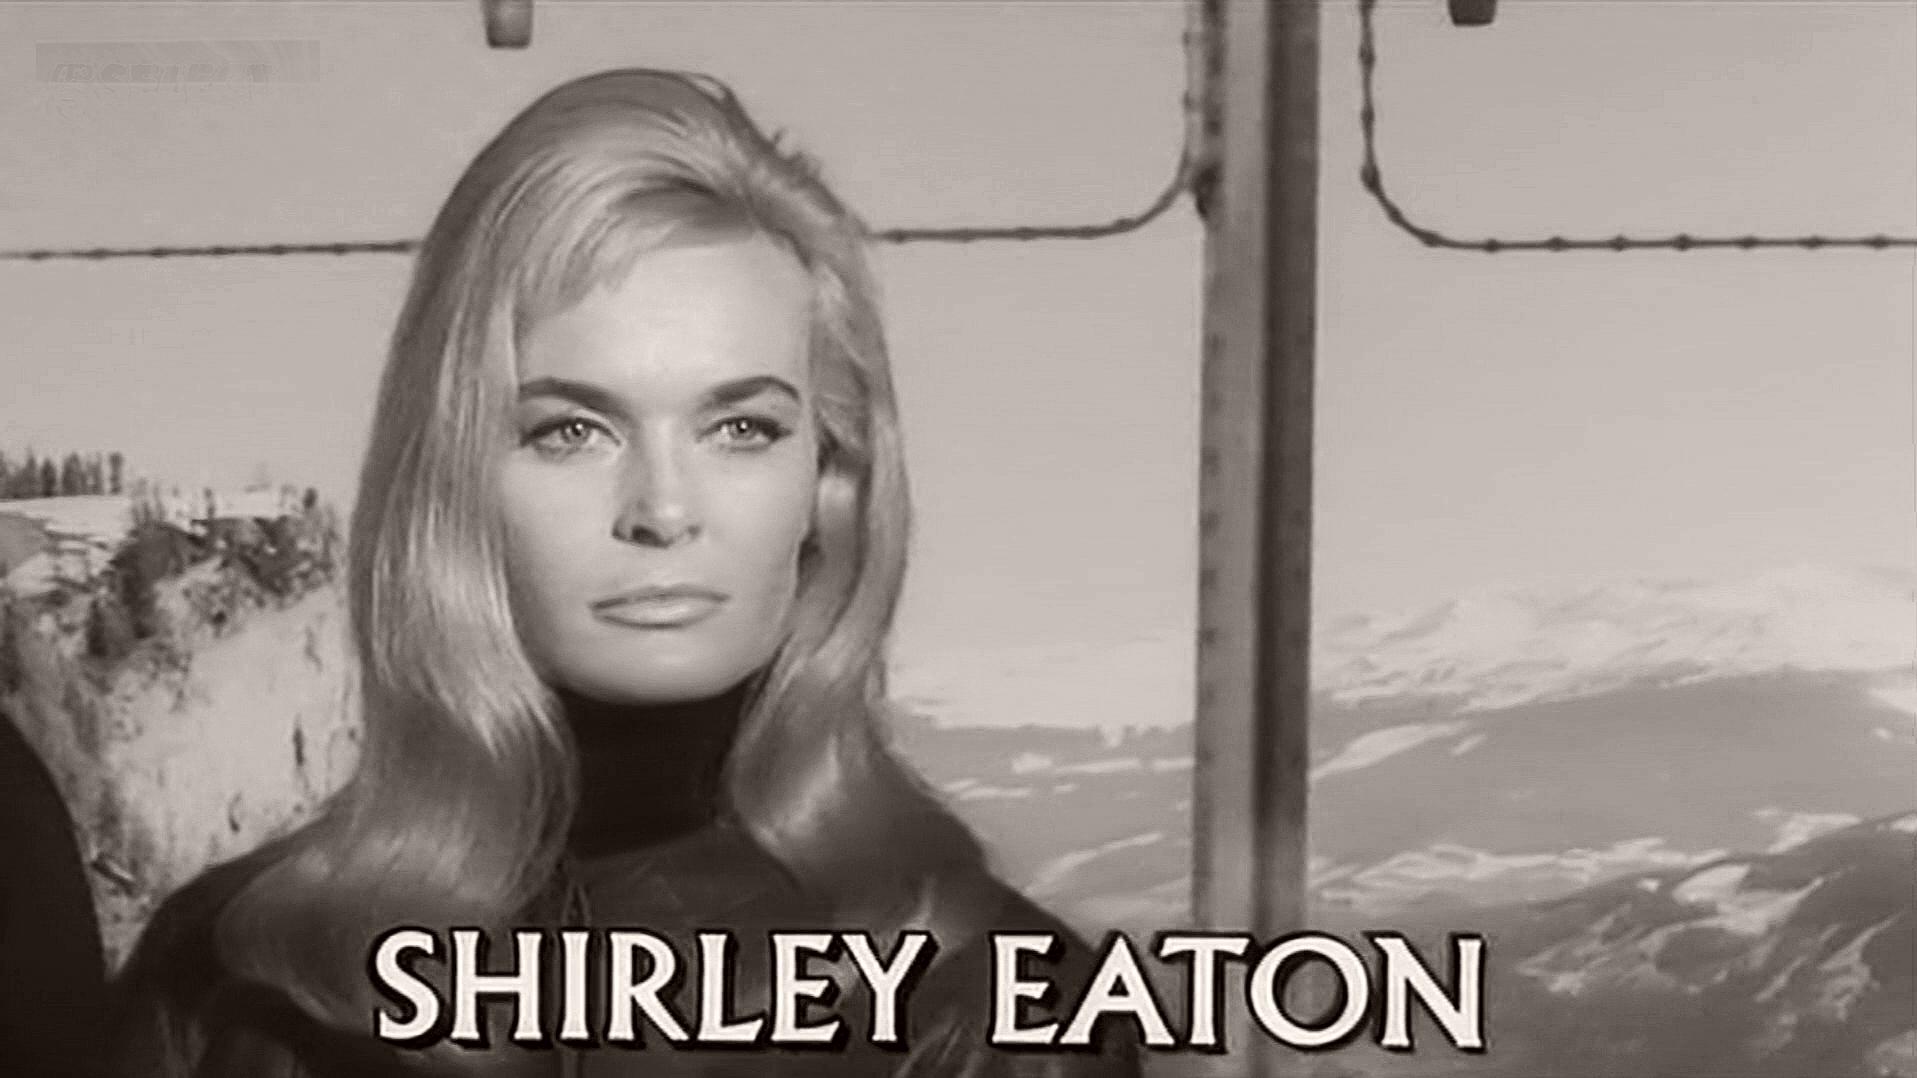 shirley eaton age